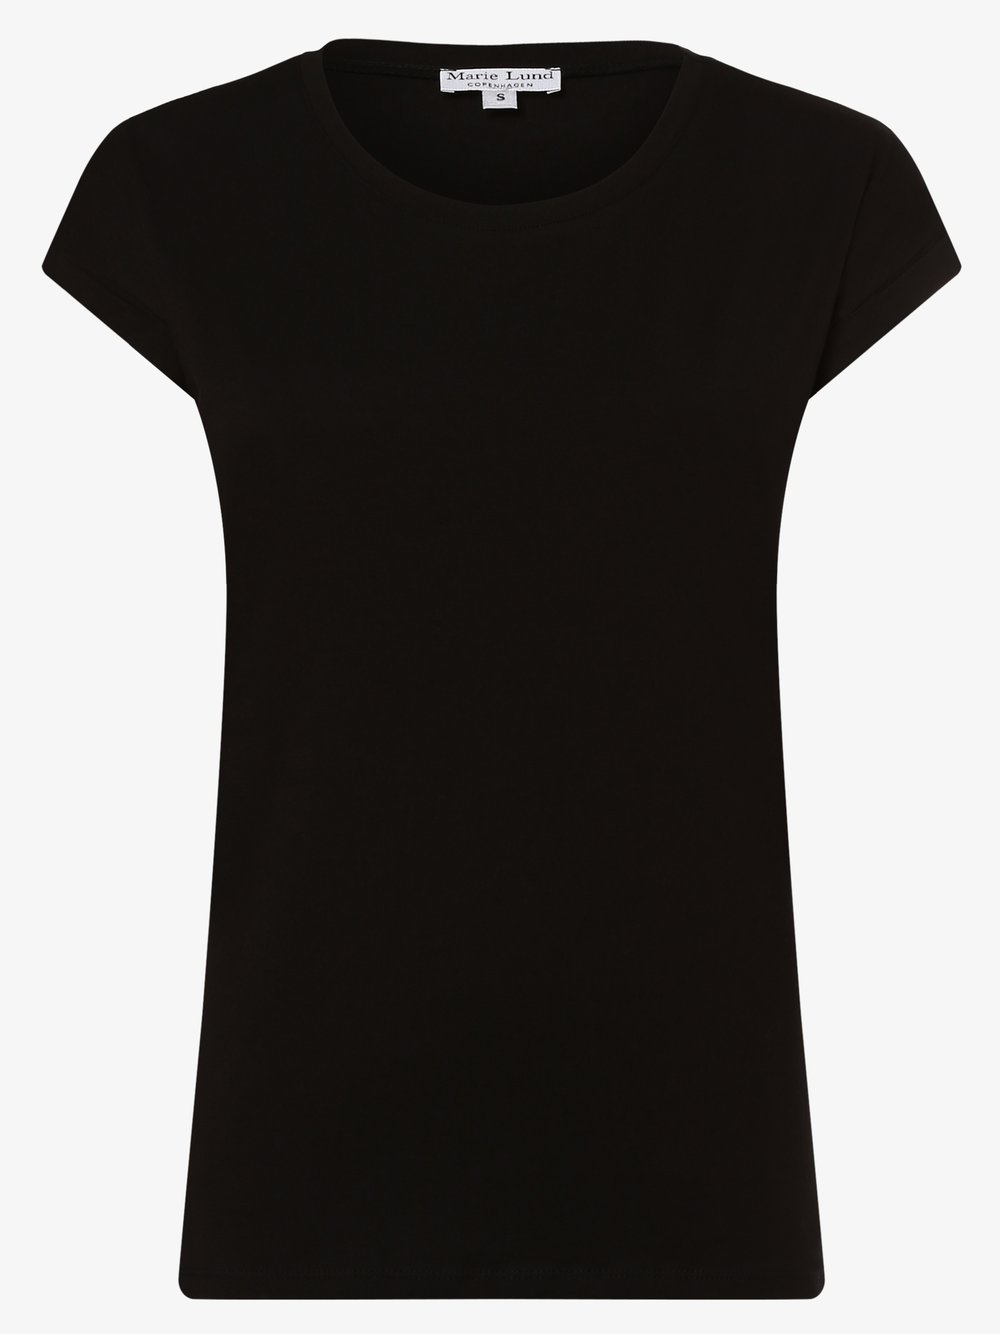 Marie Lund - T-shirt damski, czarny